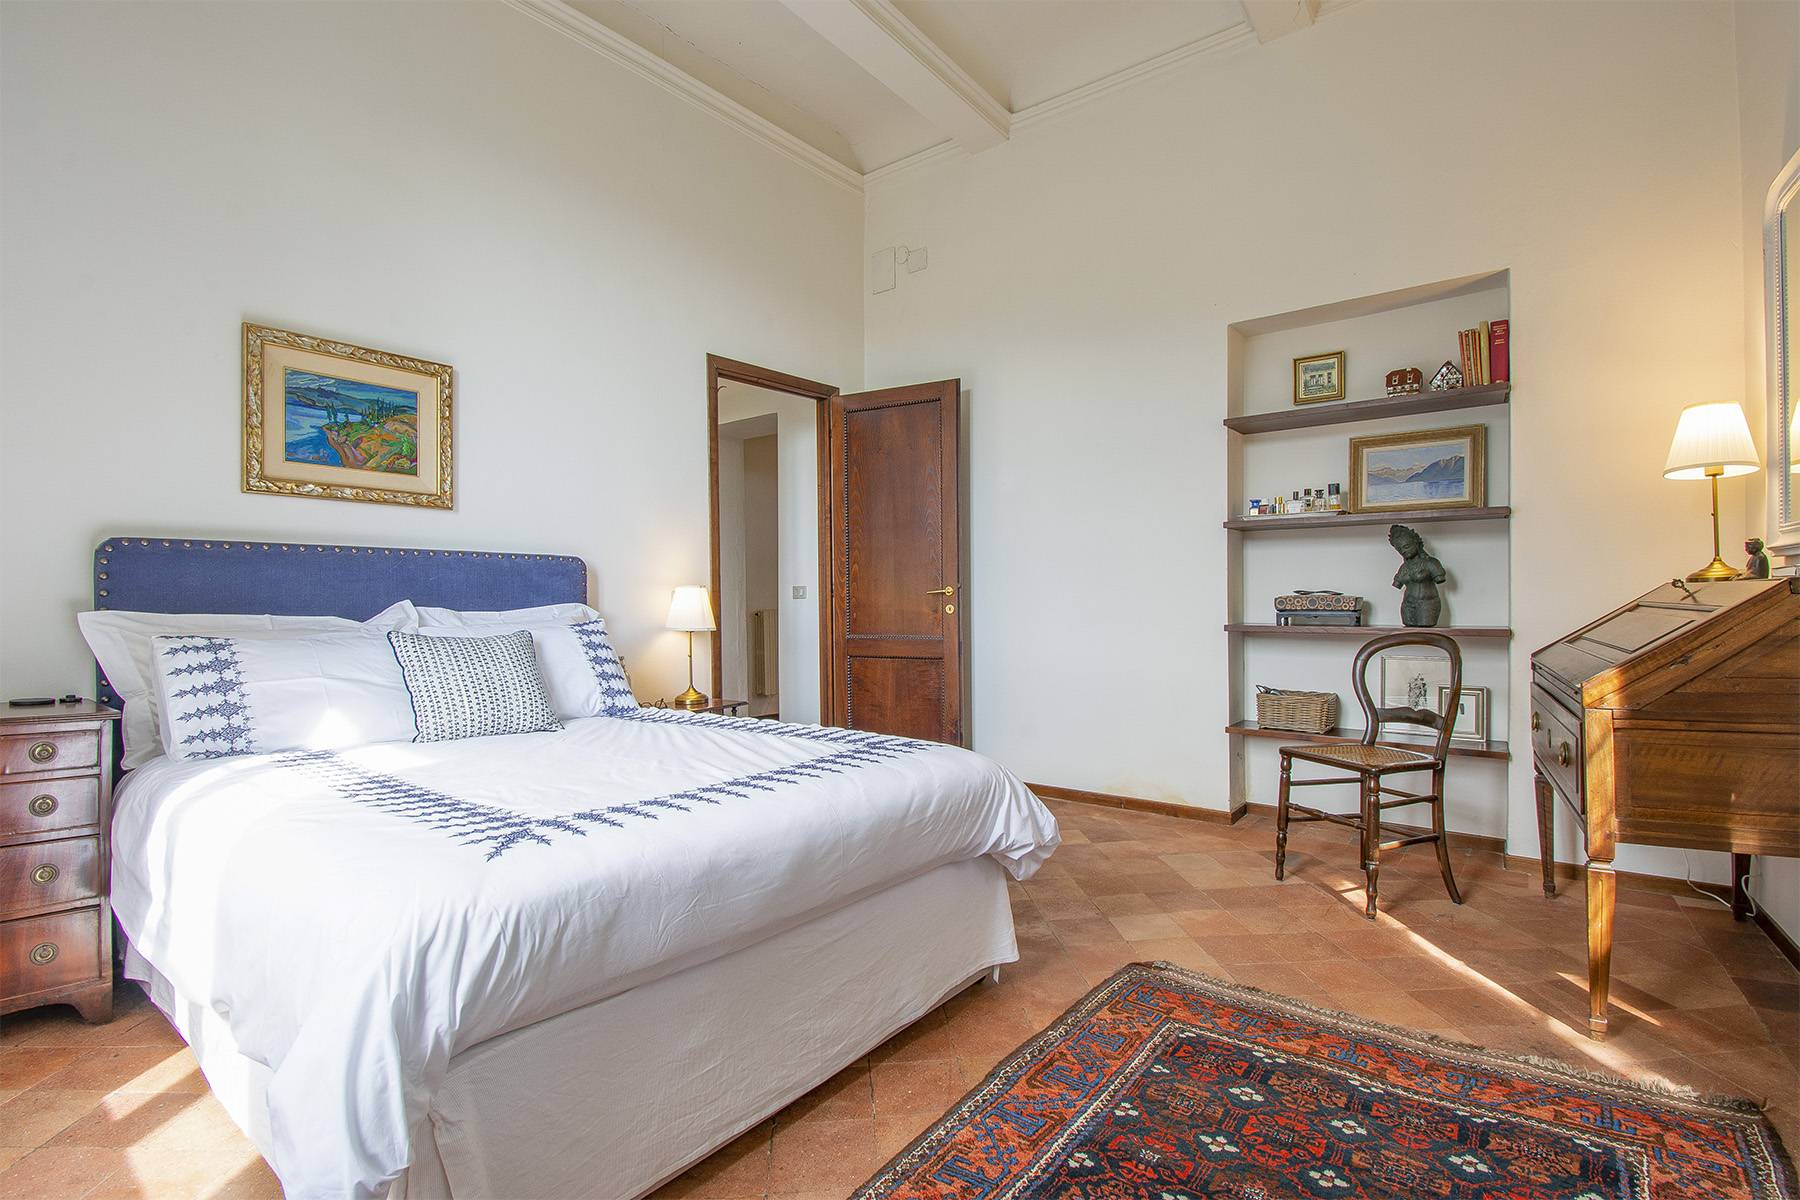 Villa in Vendita a Capannori: 5 locali, 380 mq - Foto 18